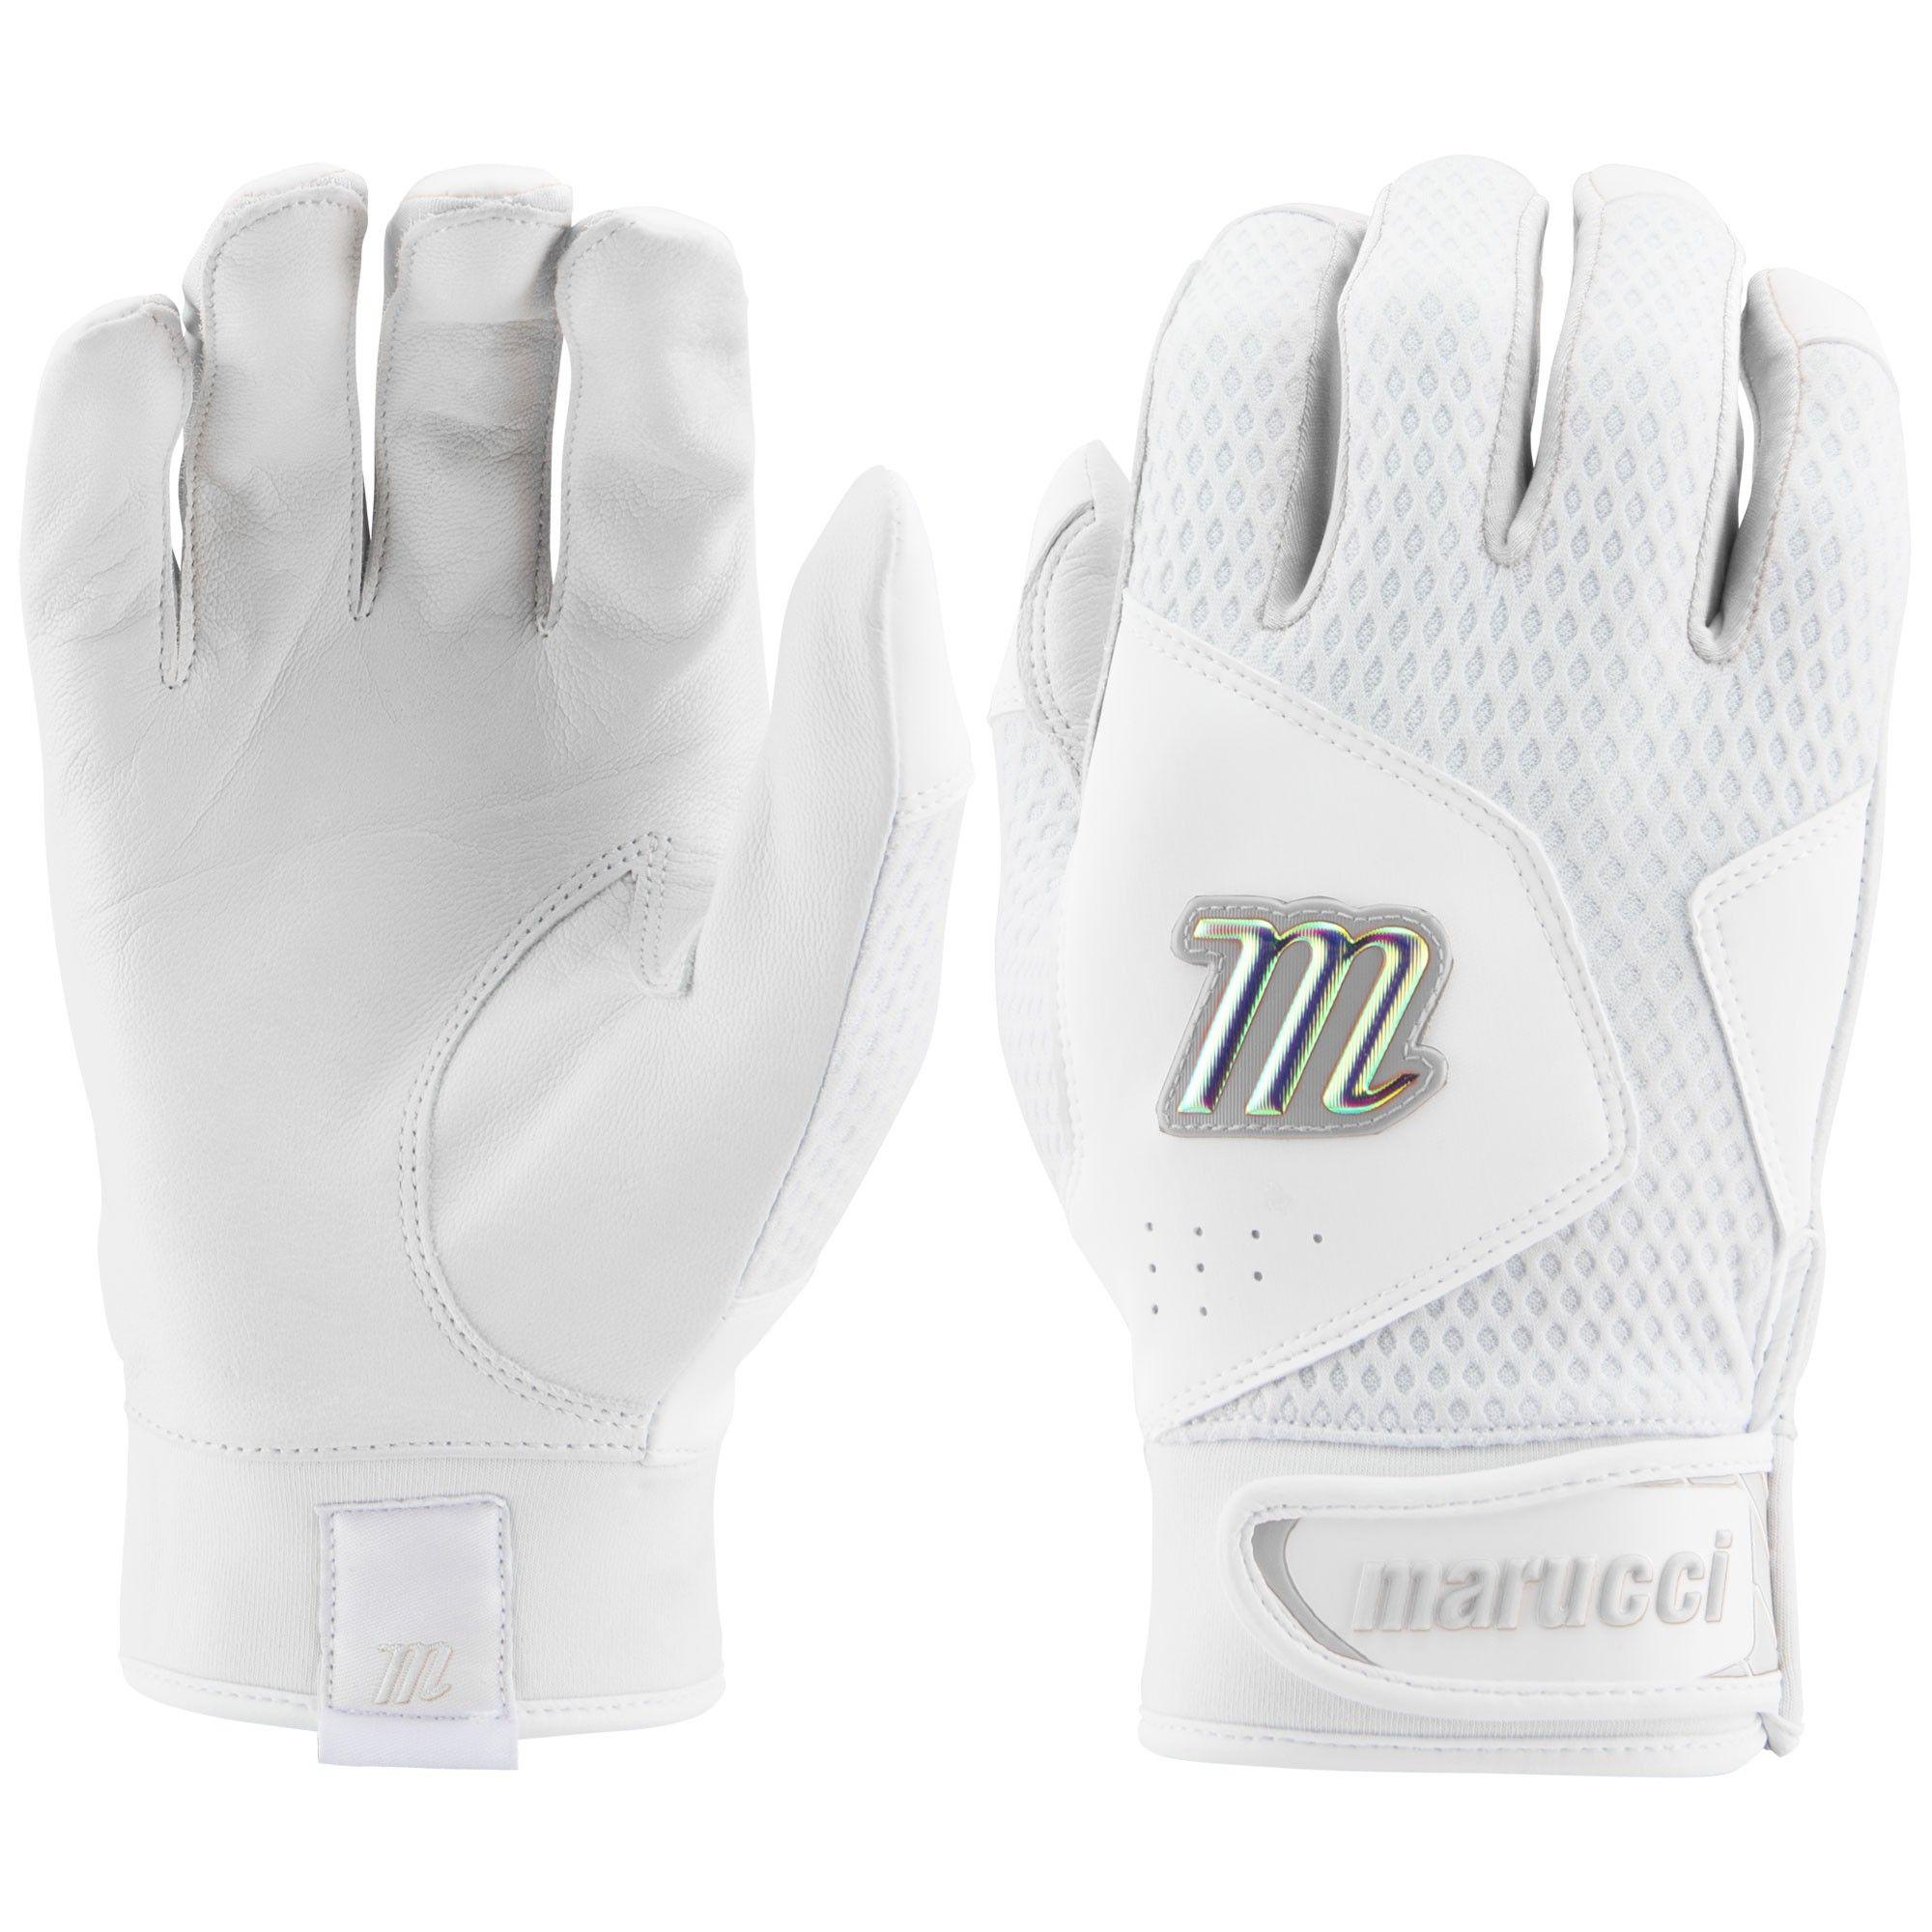 NEW Marucci Quest 2.0 Senior Baseball Batting Gloves Black